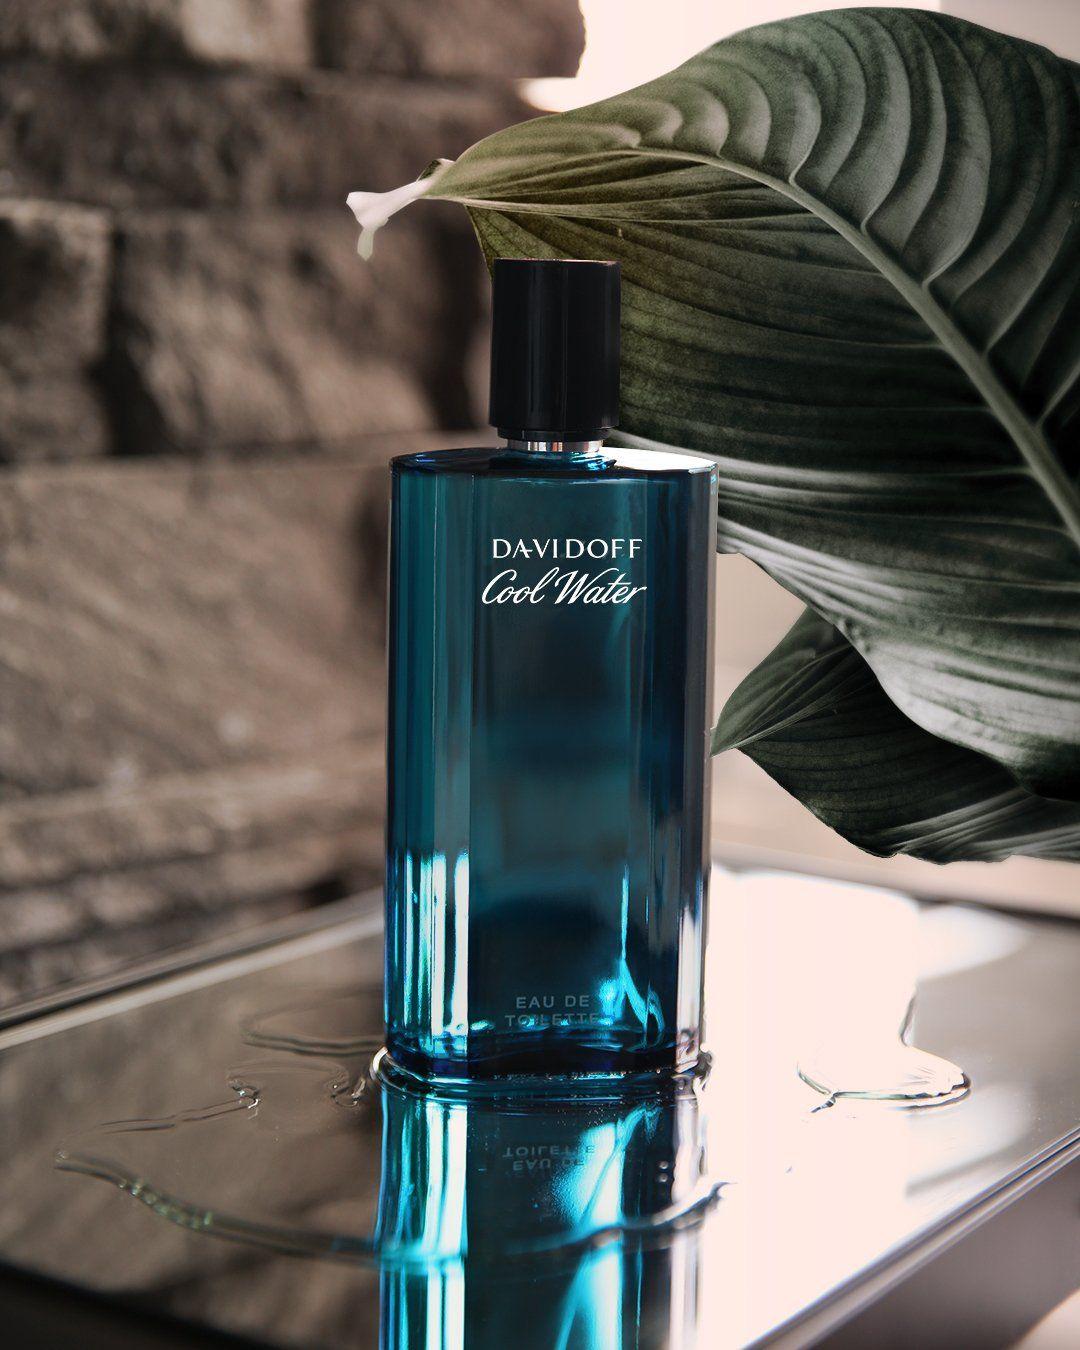 عطر دافيدوف كول واتر ماء تواليت Davidoff Cool Water Eau De Toilette عطر العطر Perfume Bottles Perfume Eau De Toilette